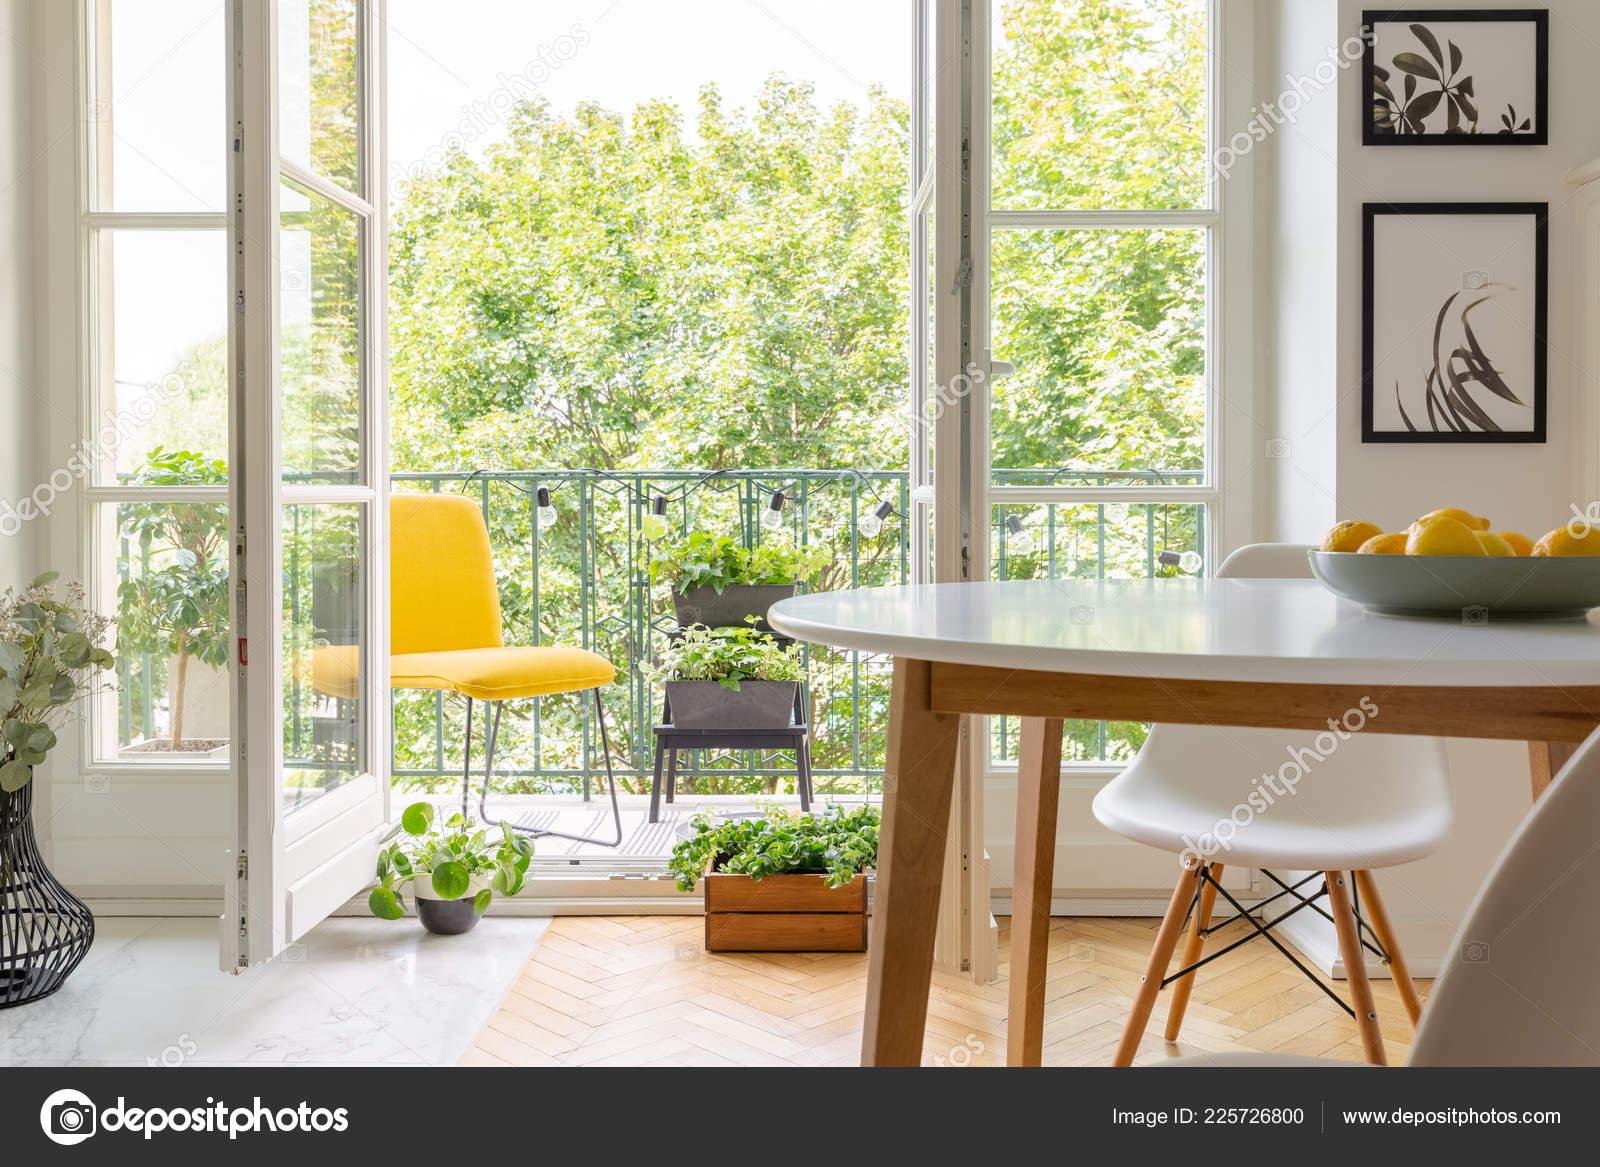 wood kitchen chairs appliance deals 黄色椅子在优雅的厨房内部的阳台上墙上有白色的木椅和海报真实的照片 黄色椅子在优雅的厨房内部的阳台上 墙上有白色的木椅和海报 真实的照片 照片作者photographee eu